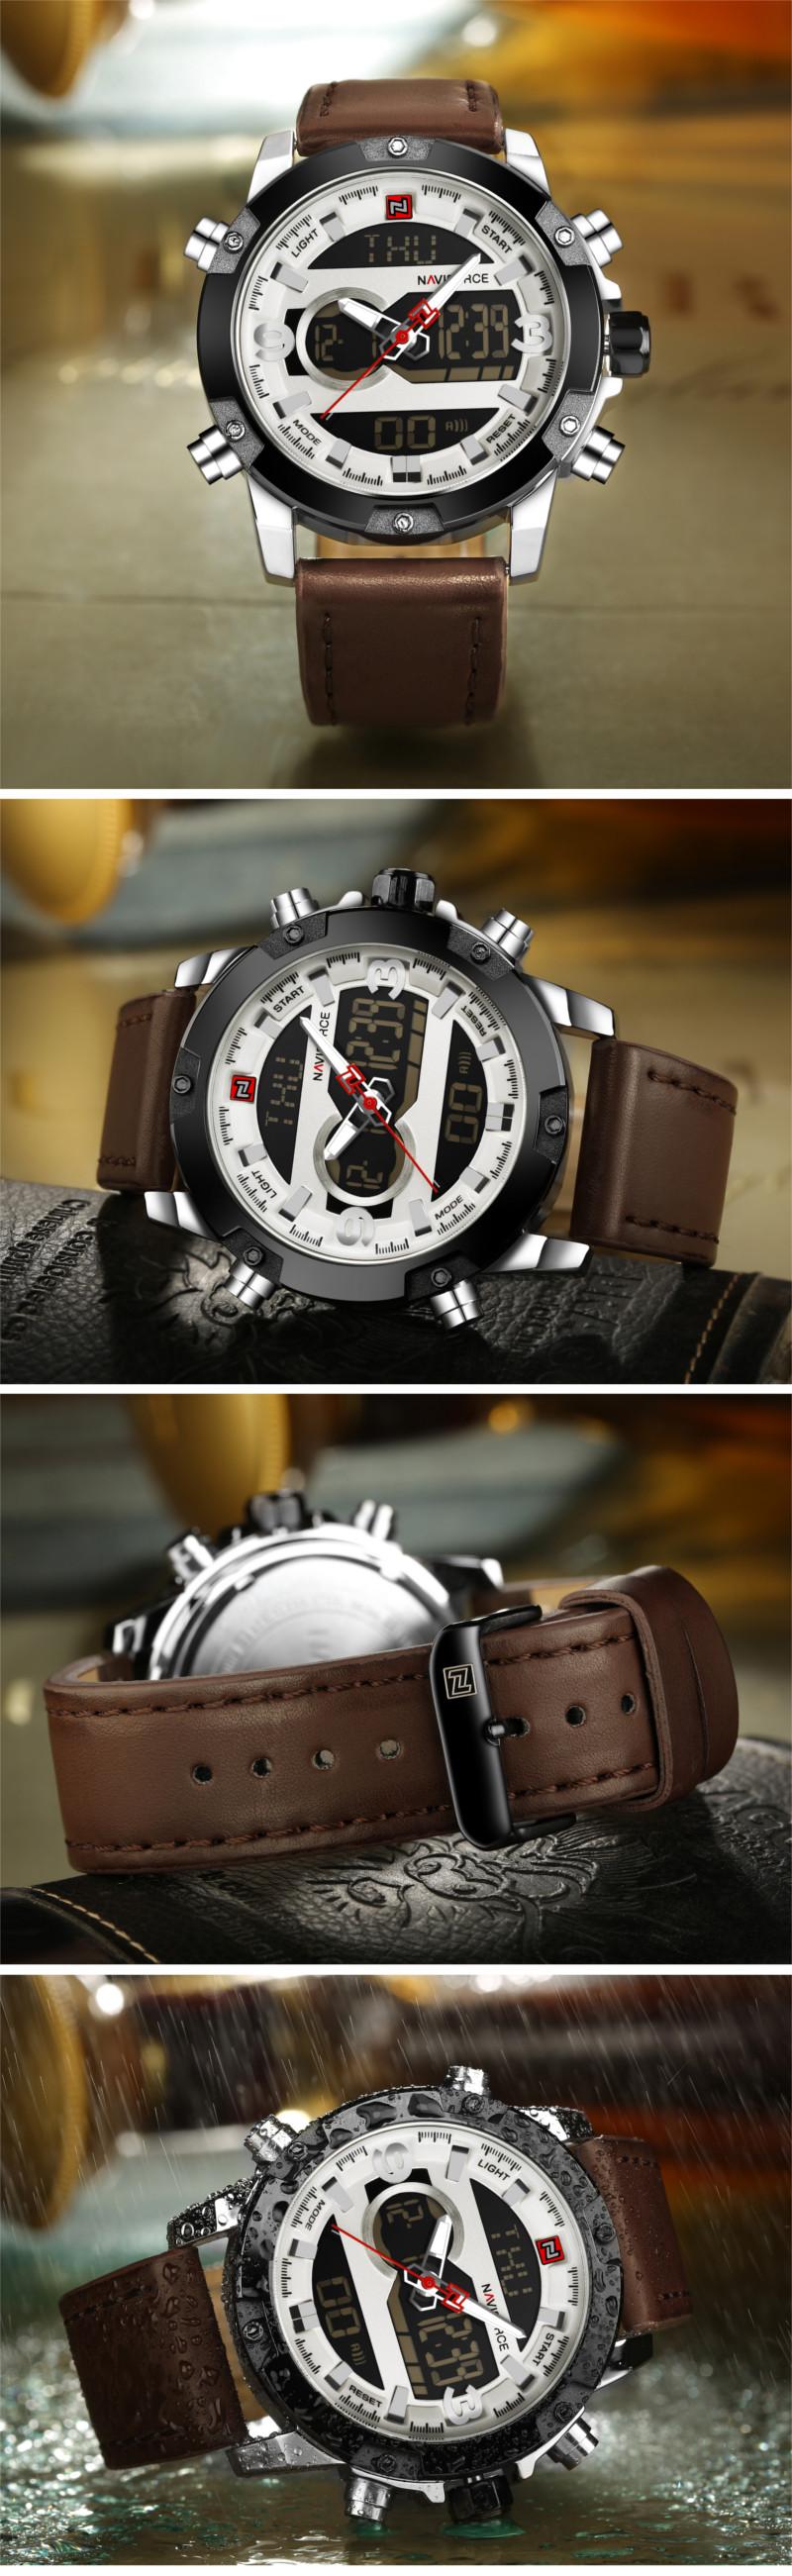 NAVIFORCE NF9097 Fashion Men Dual Display Watch Luxury Leather Strap Sport Watch